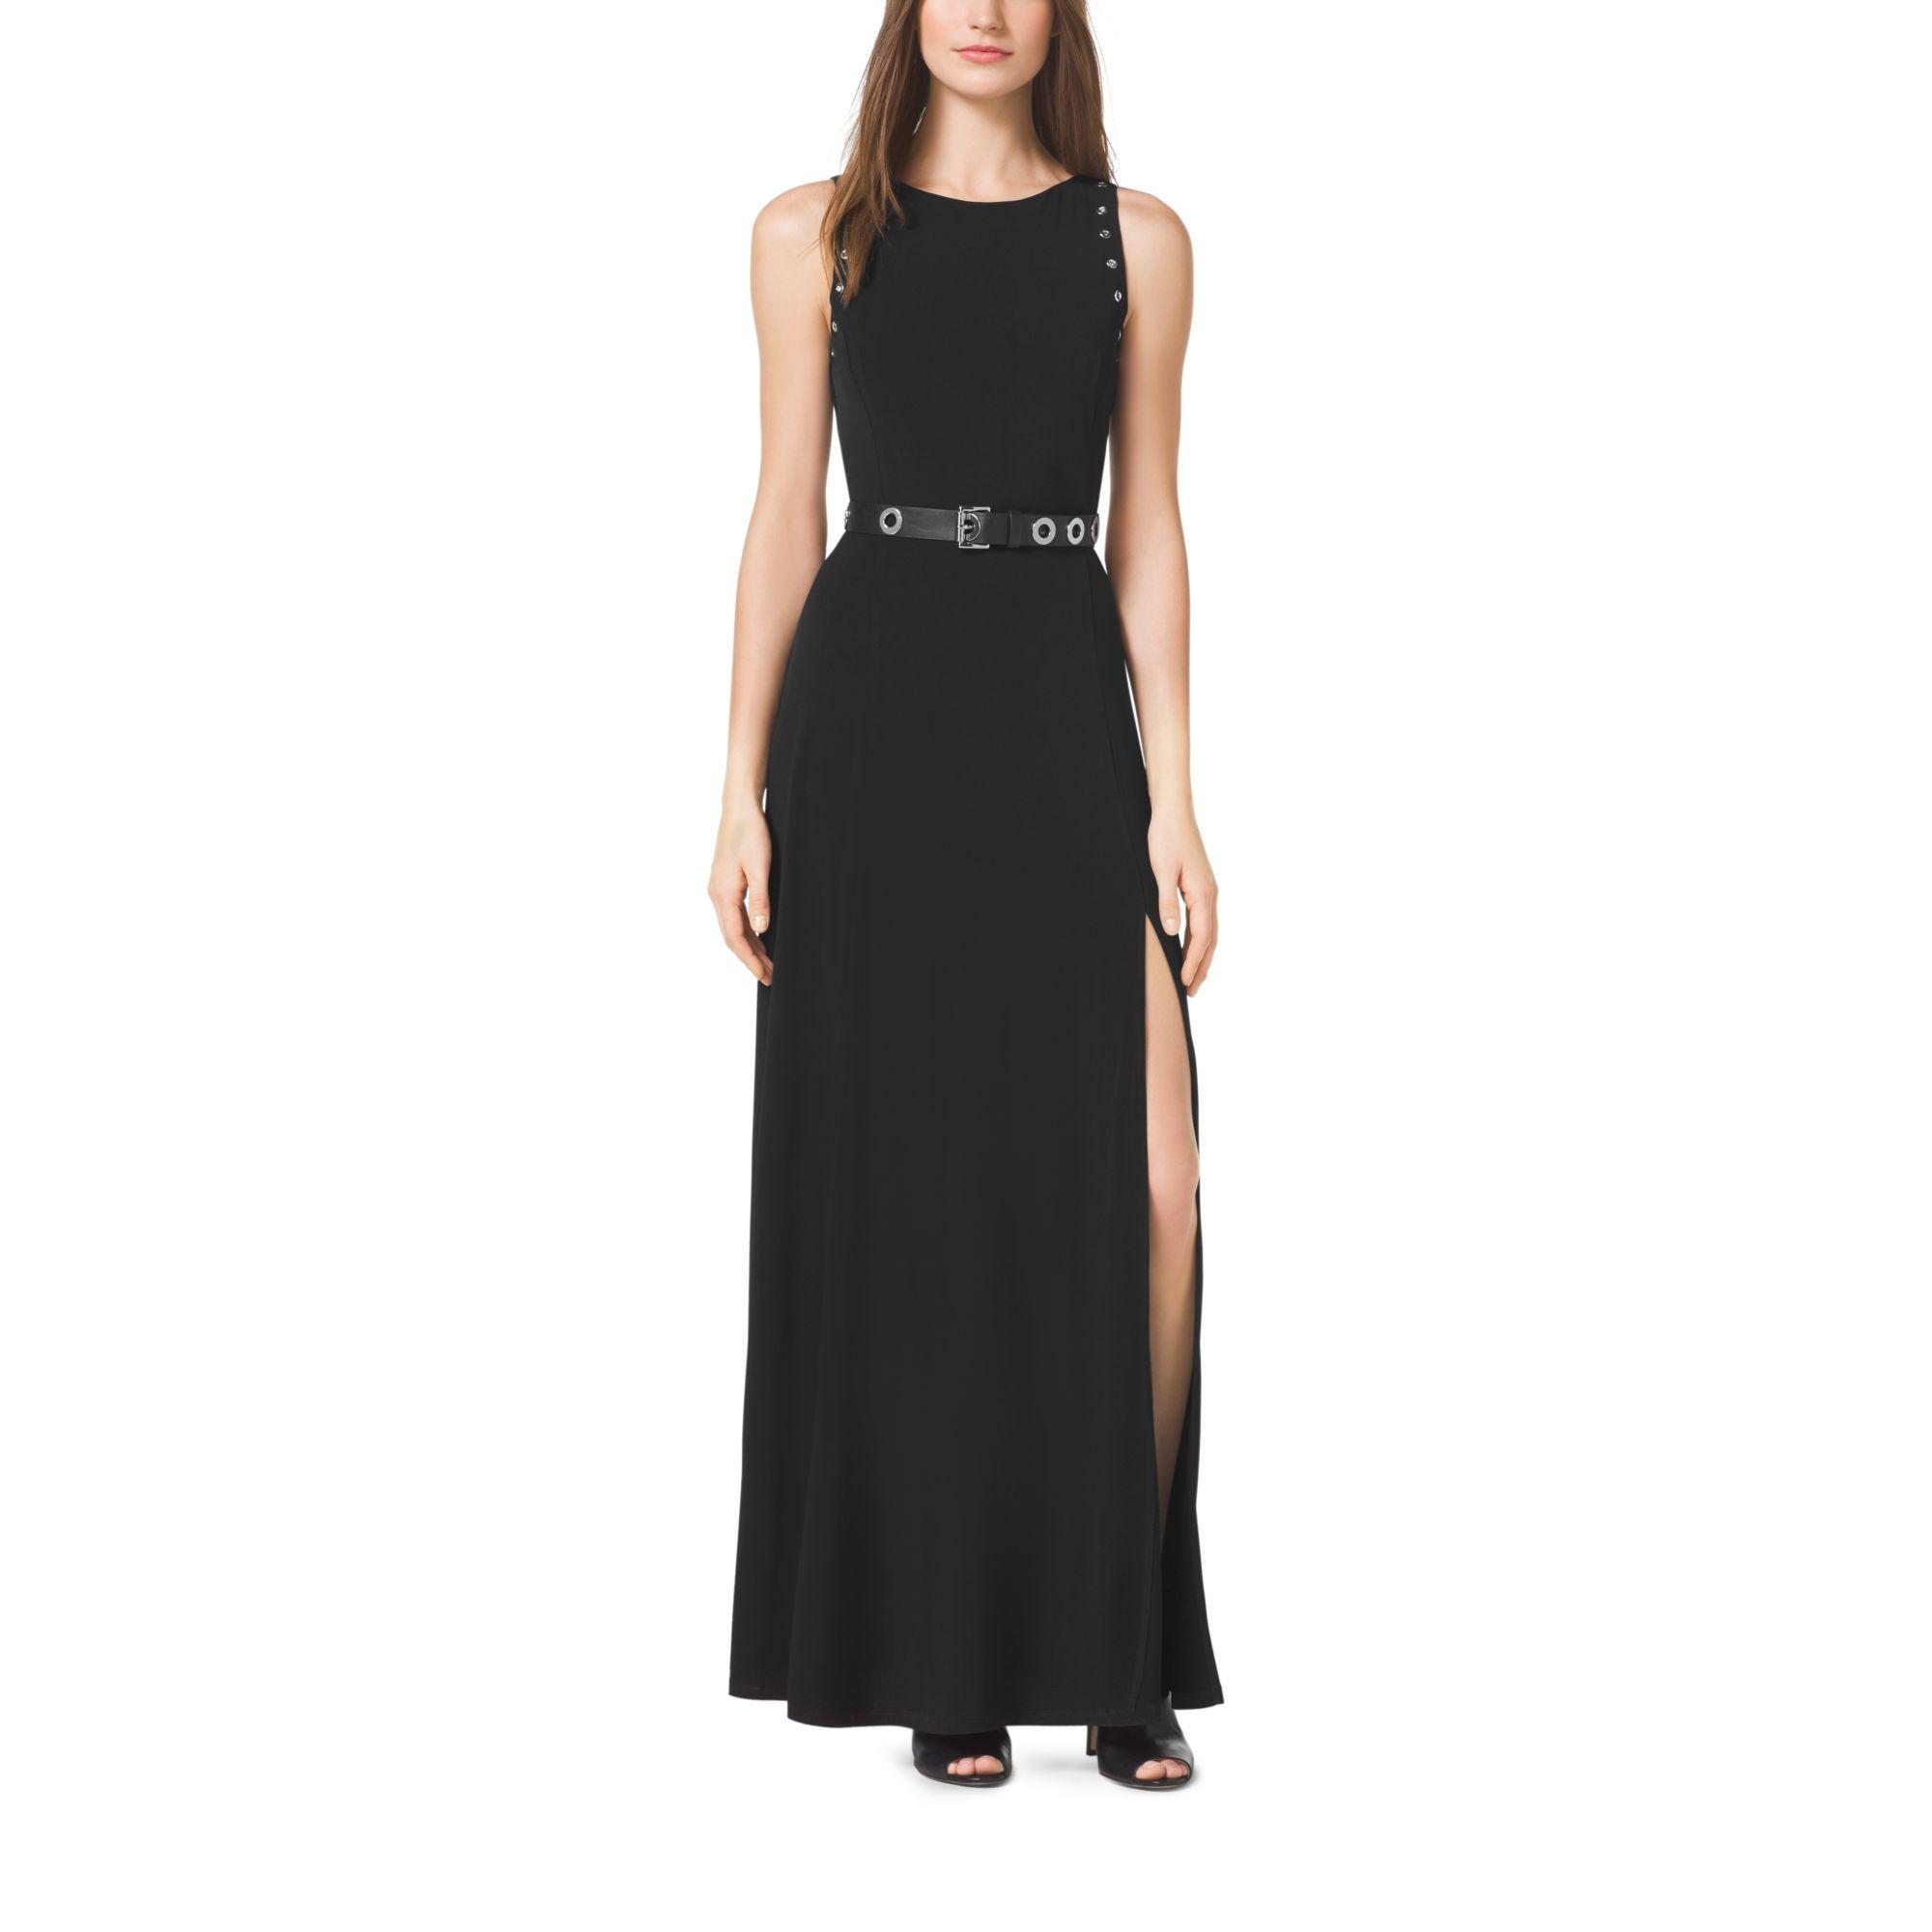 7f0d4815c5 Michael Kors Grommet Belted Maxi Dress in Black - Lyst